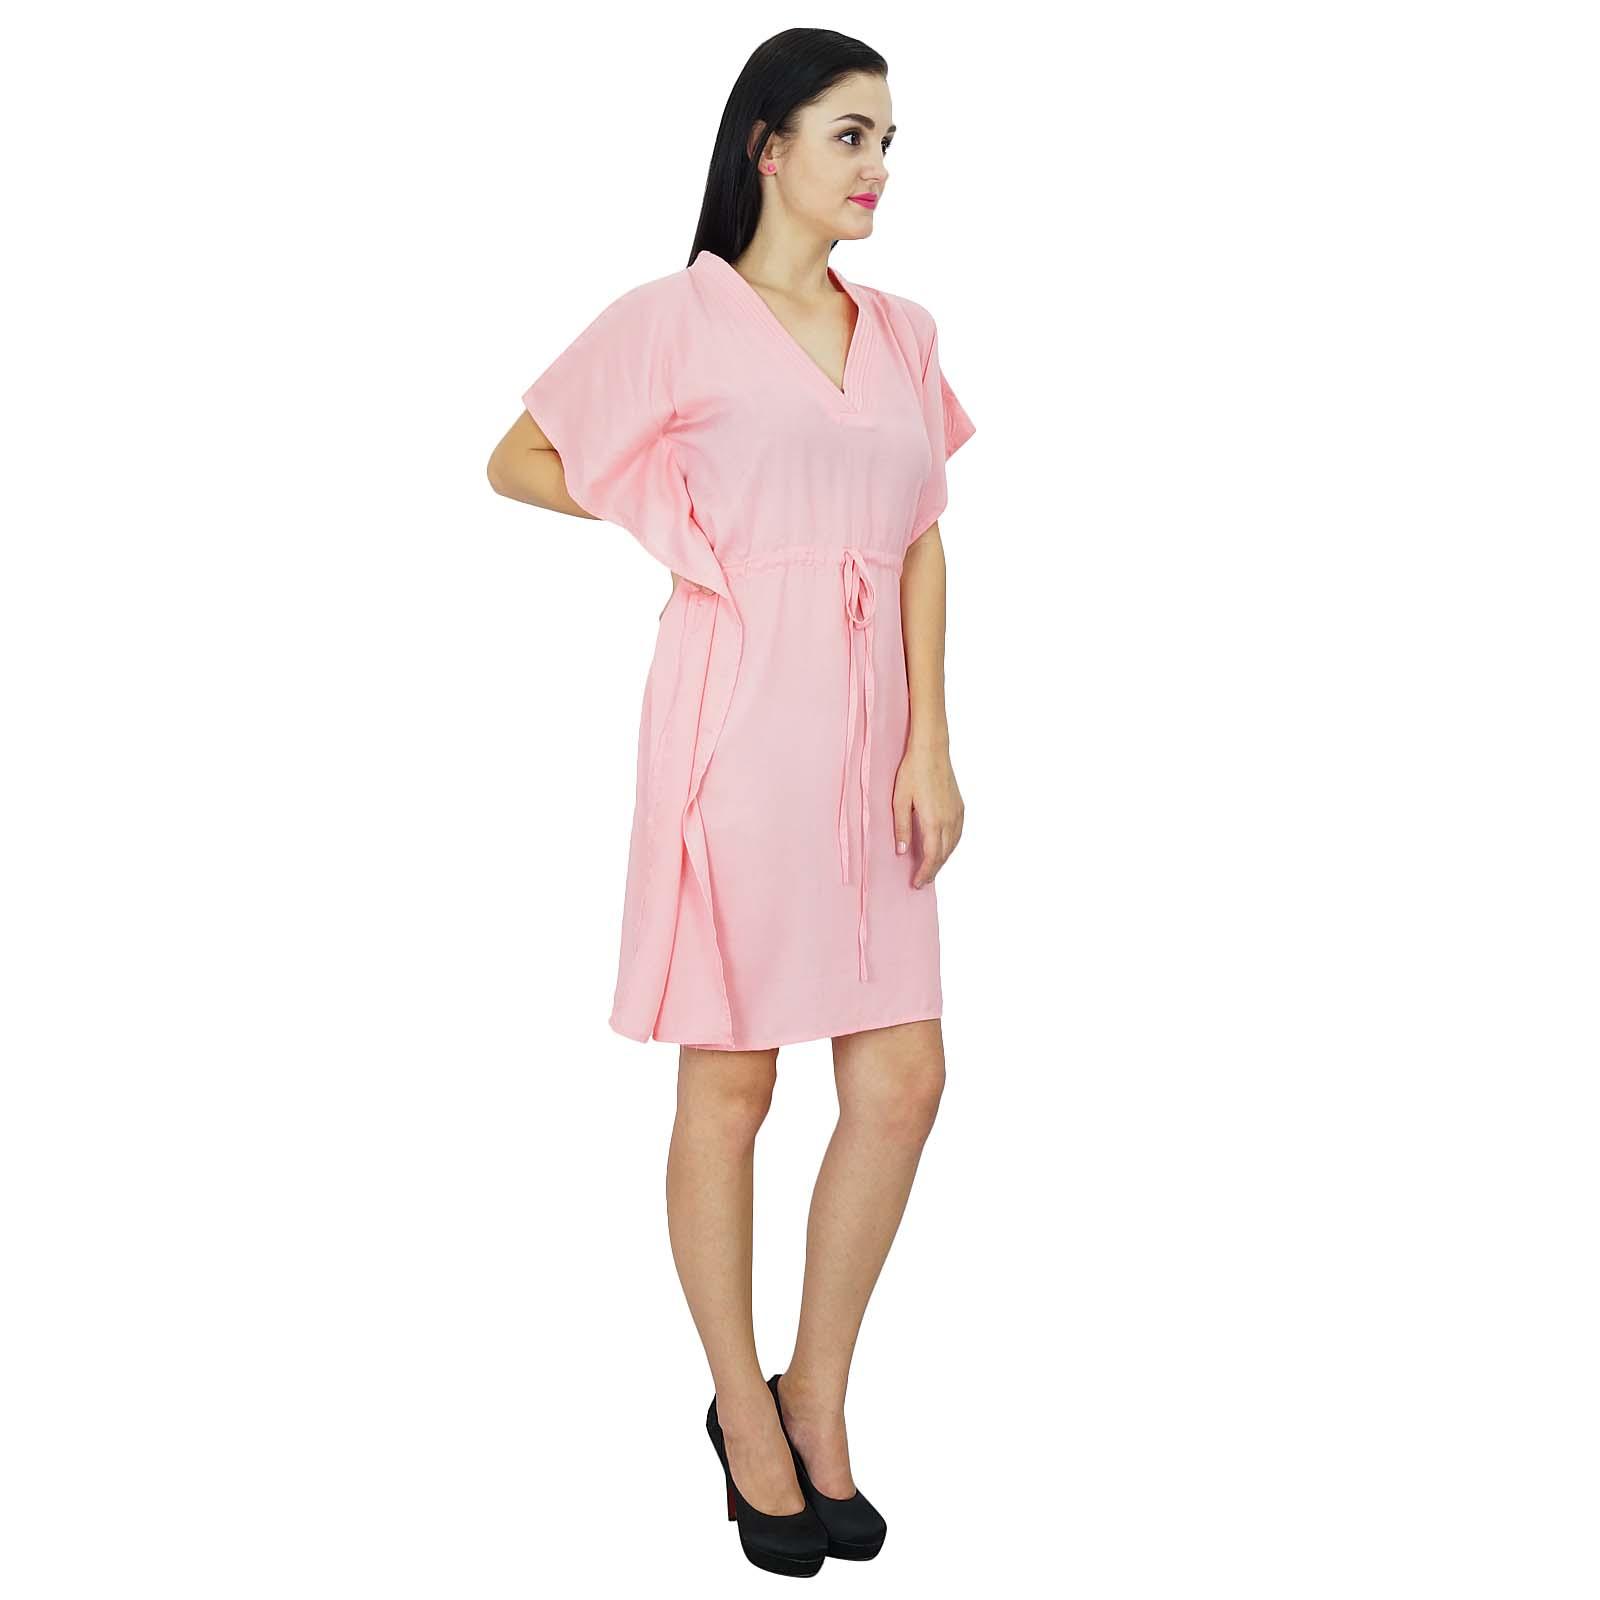 thumbnail 28 - Bimba Women Plain Kaftan Dress Beach Cover Up Cotton Solid Caftan-58z